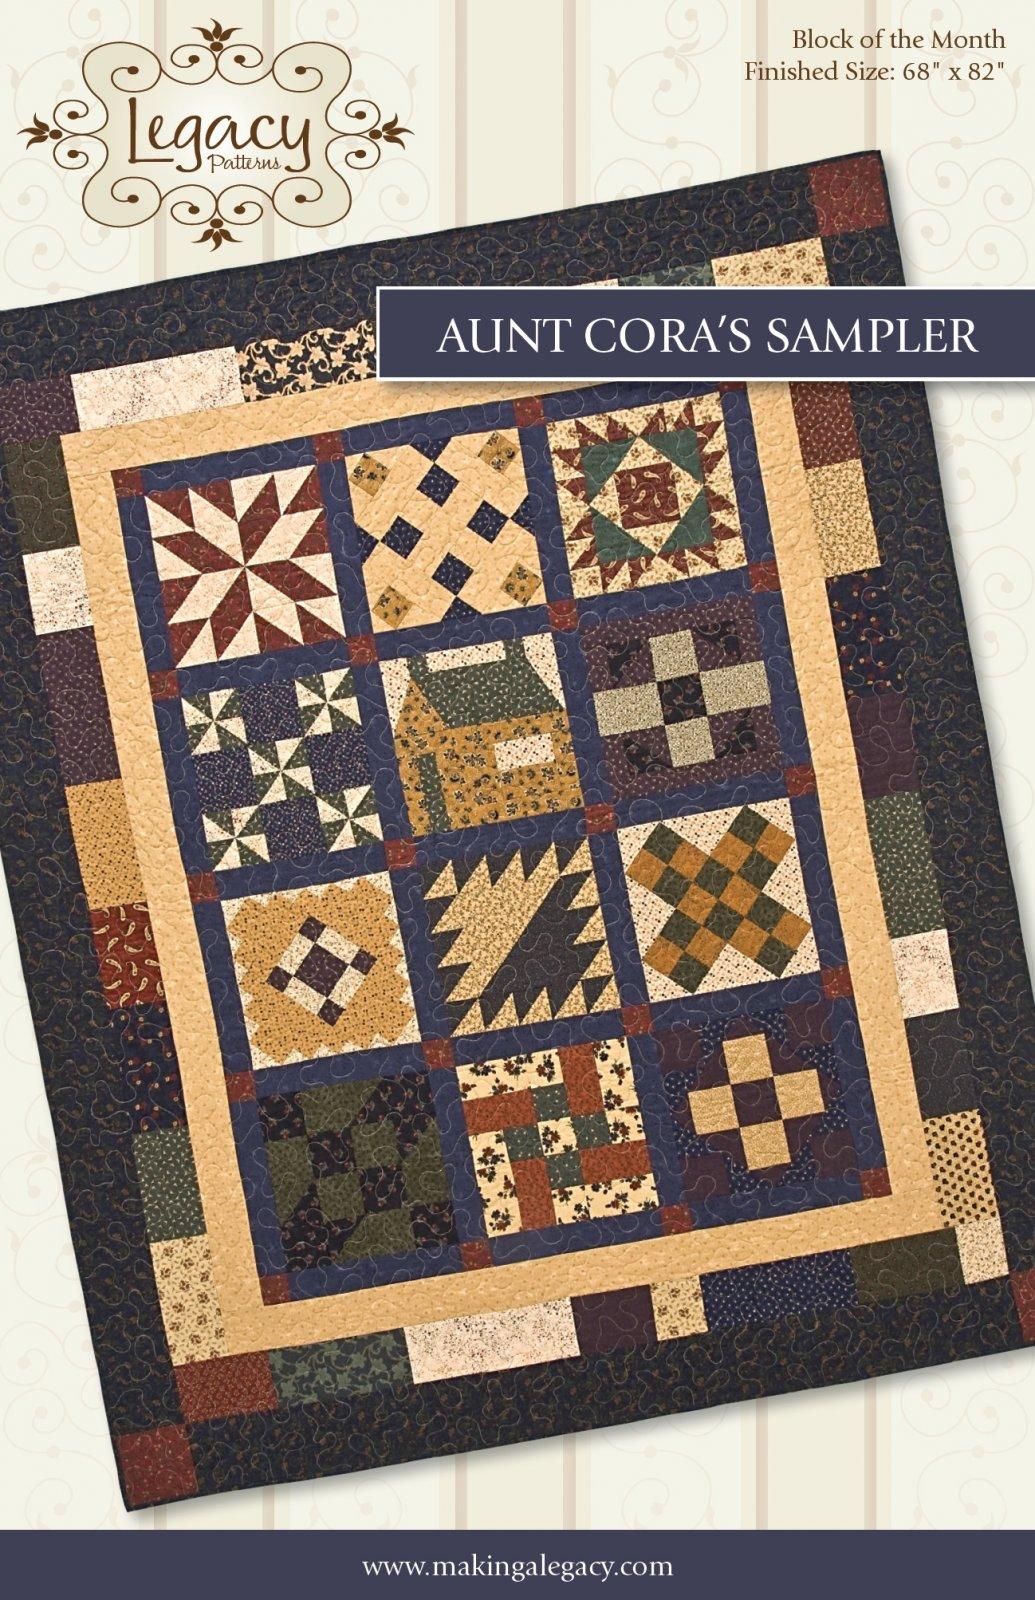 Aunt Cora's Sampler Pattern